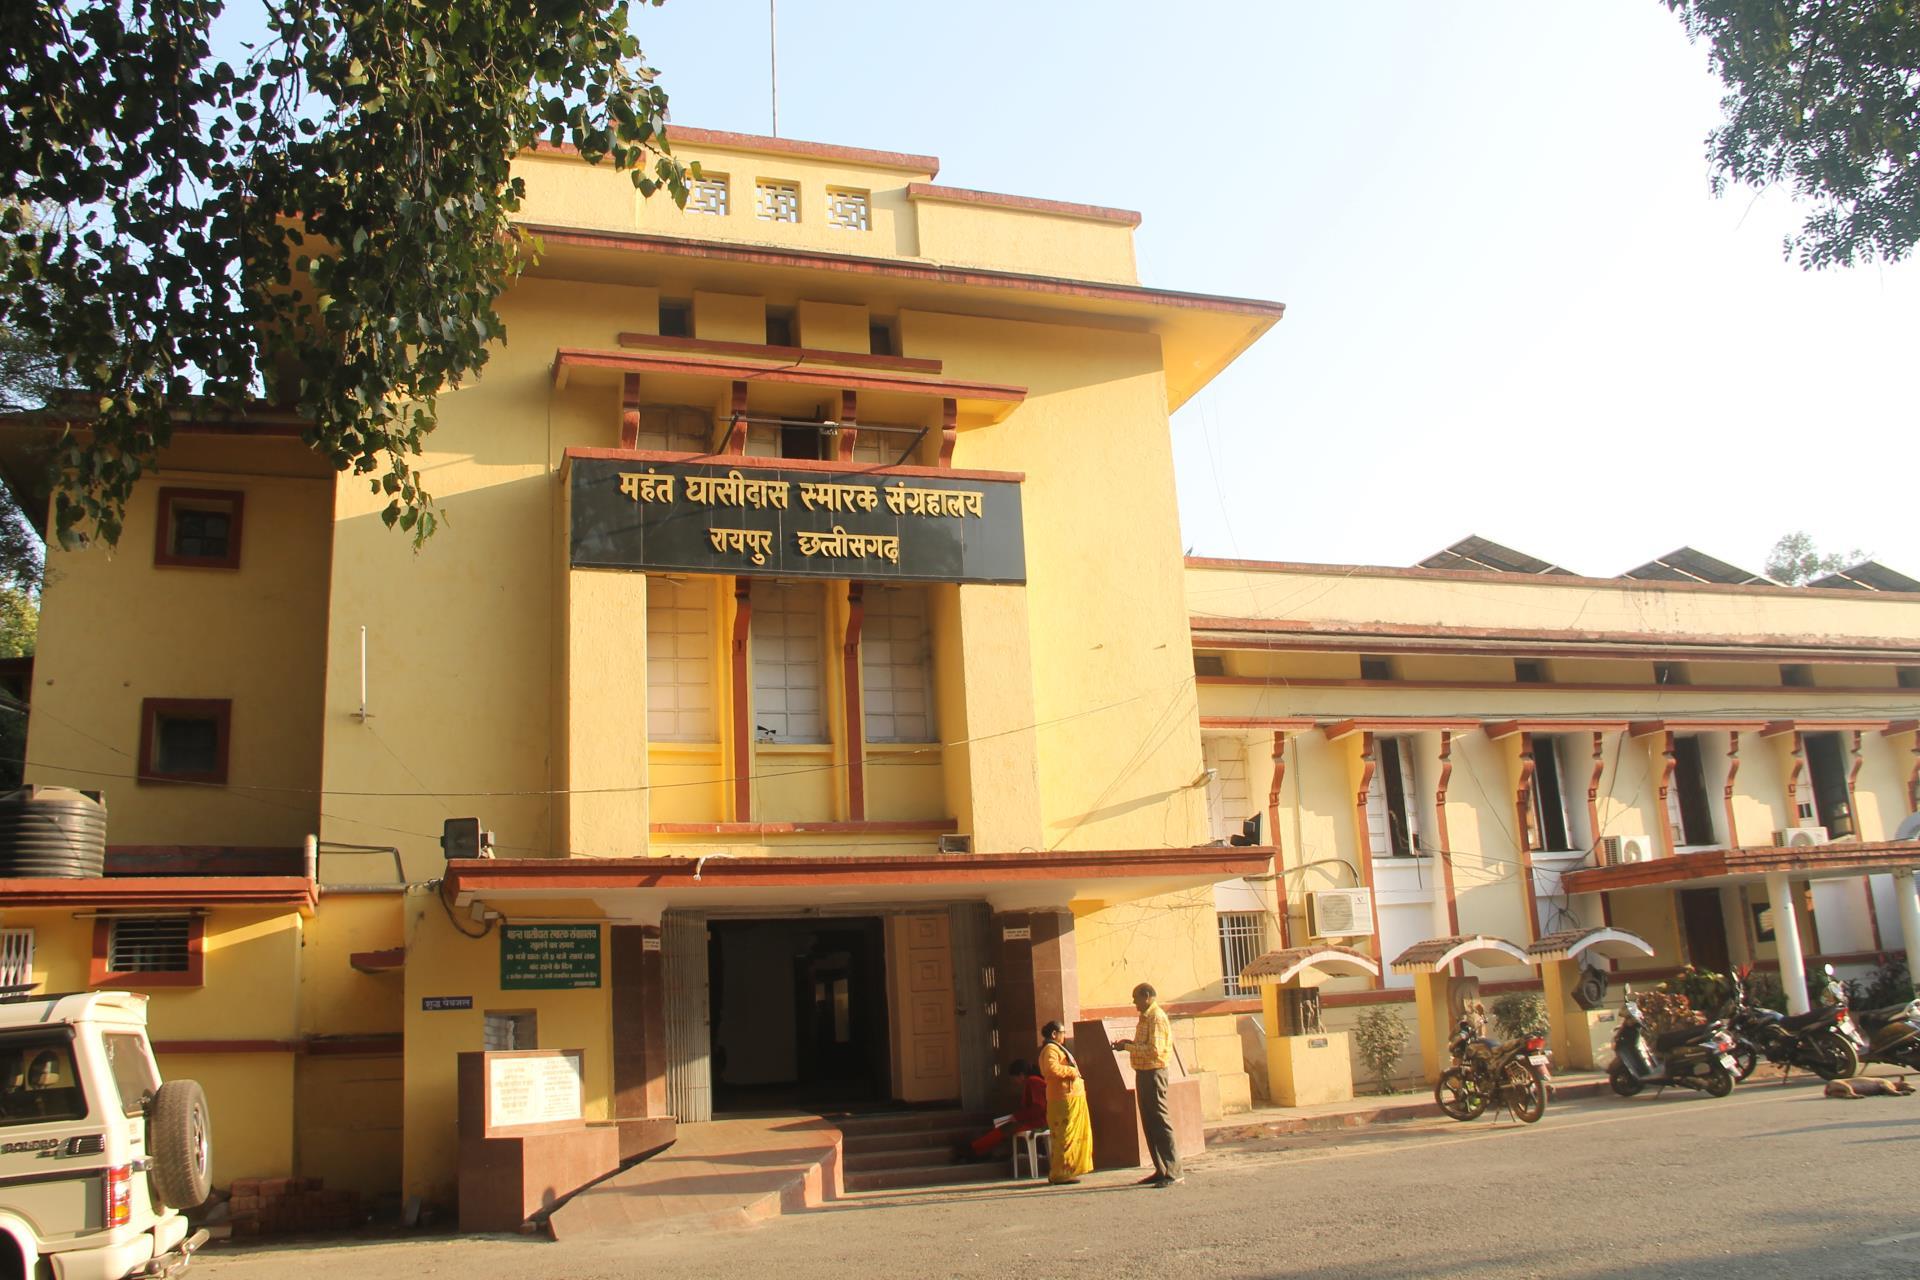 Sightseeing Attraction in Rajim, Chhattisgarh-Mahant Ghasi Memorial Museum